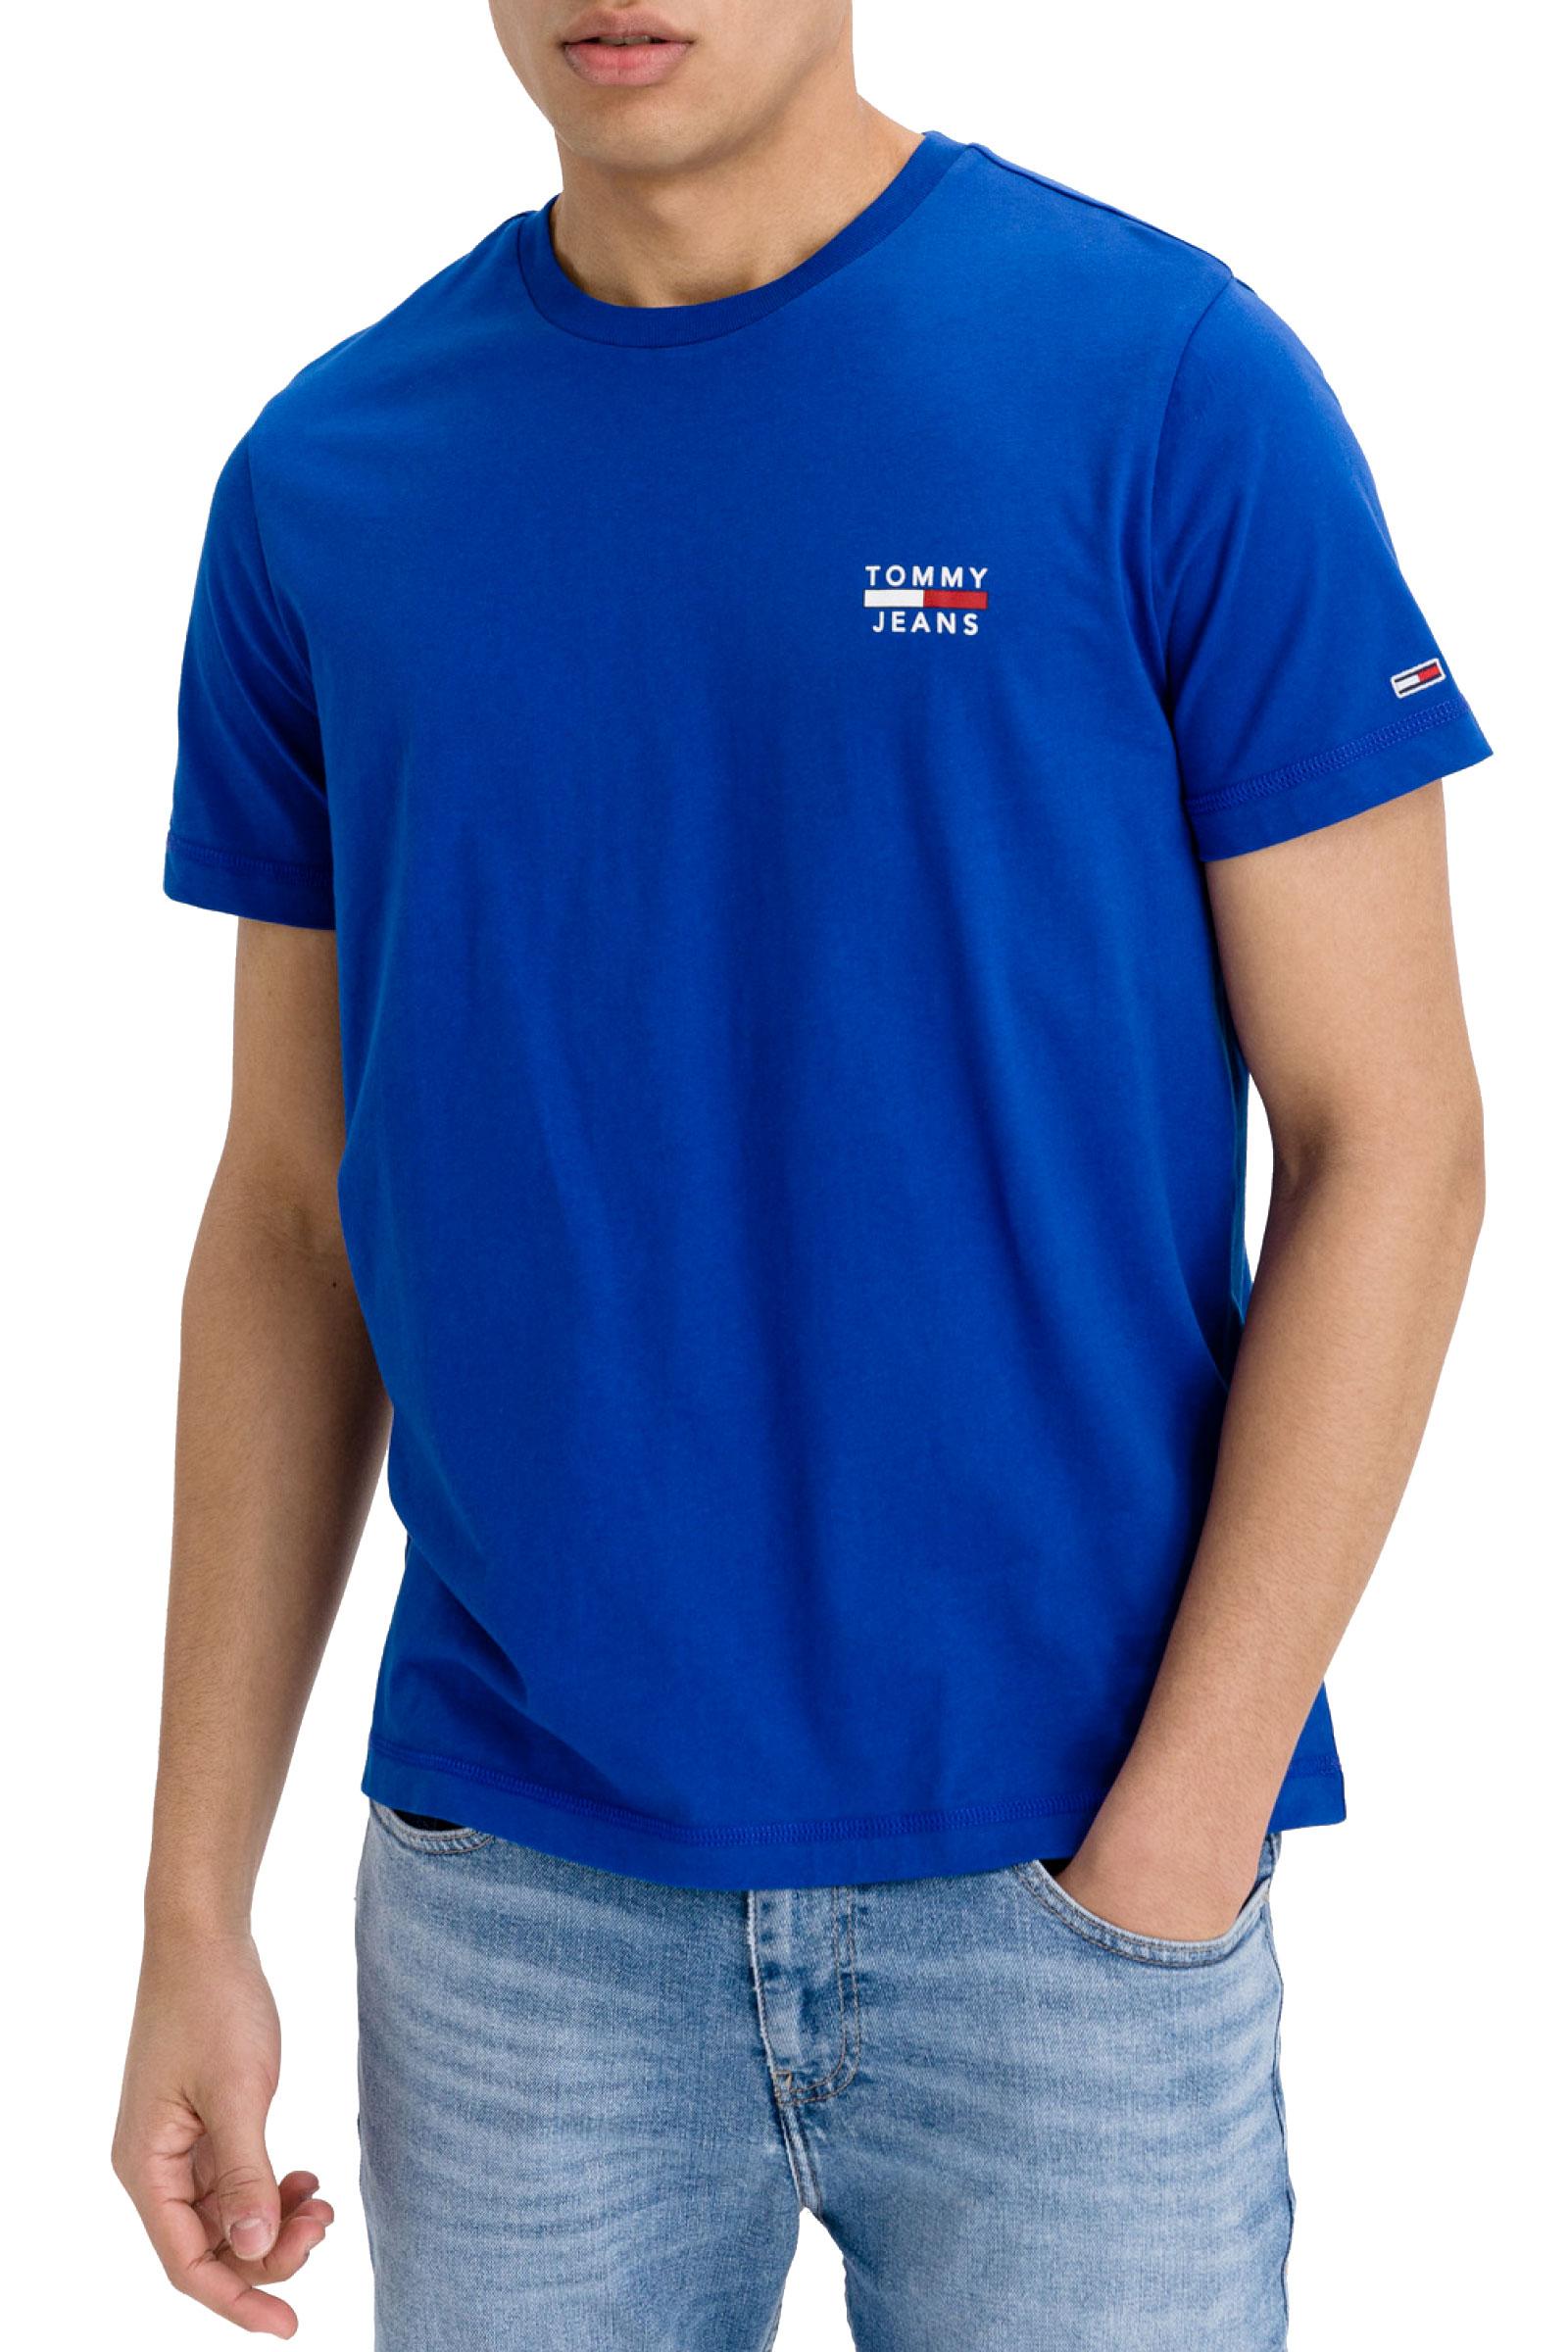 TOMMY JEANS T-Shirt Uomo TOMMY JEANS | T-Shirt | DM0DM10099C65